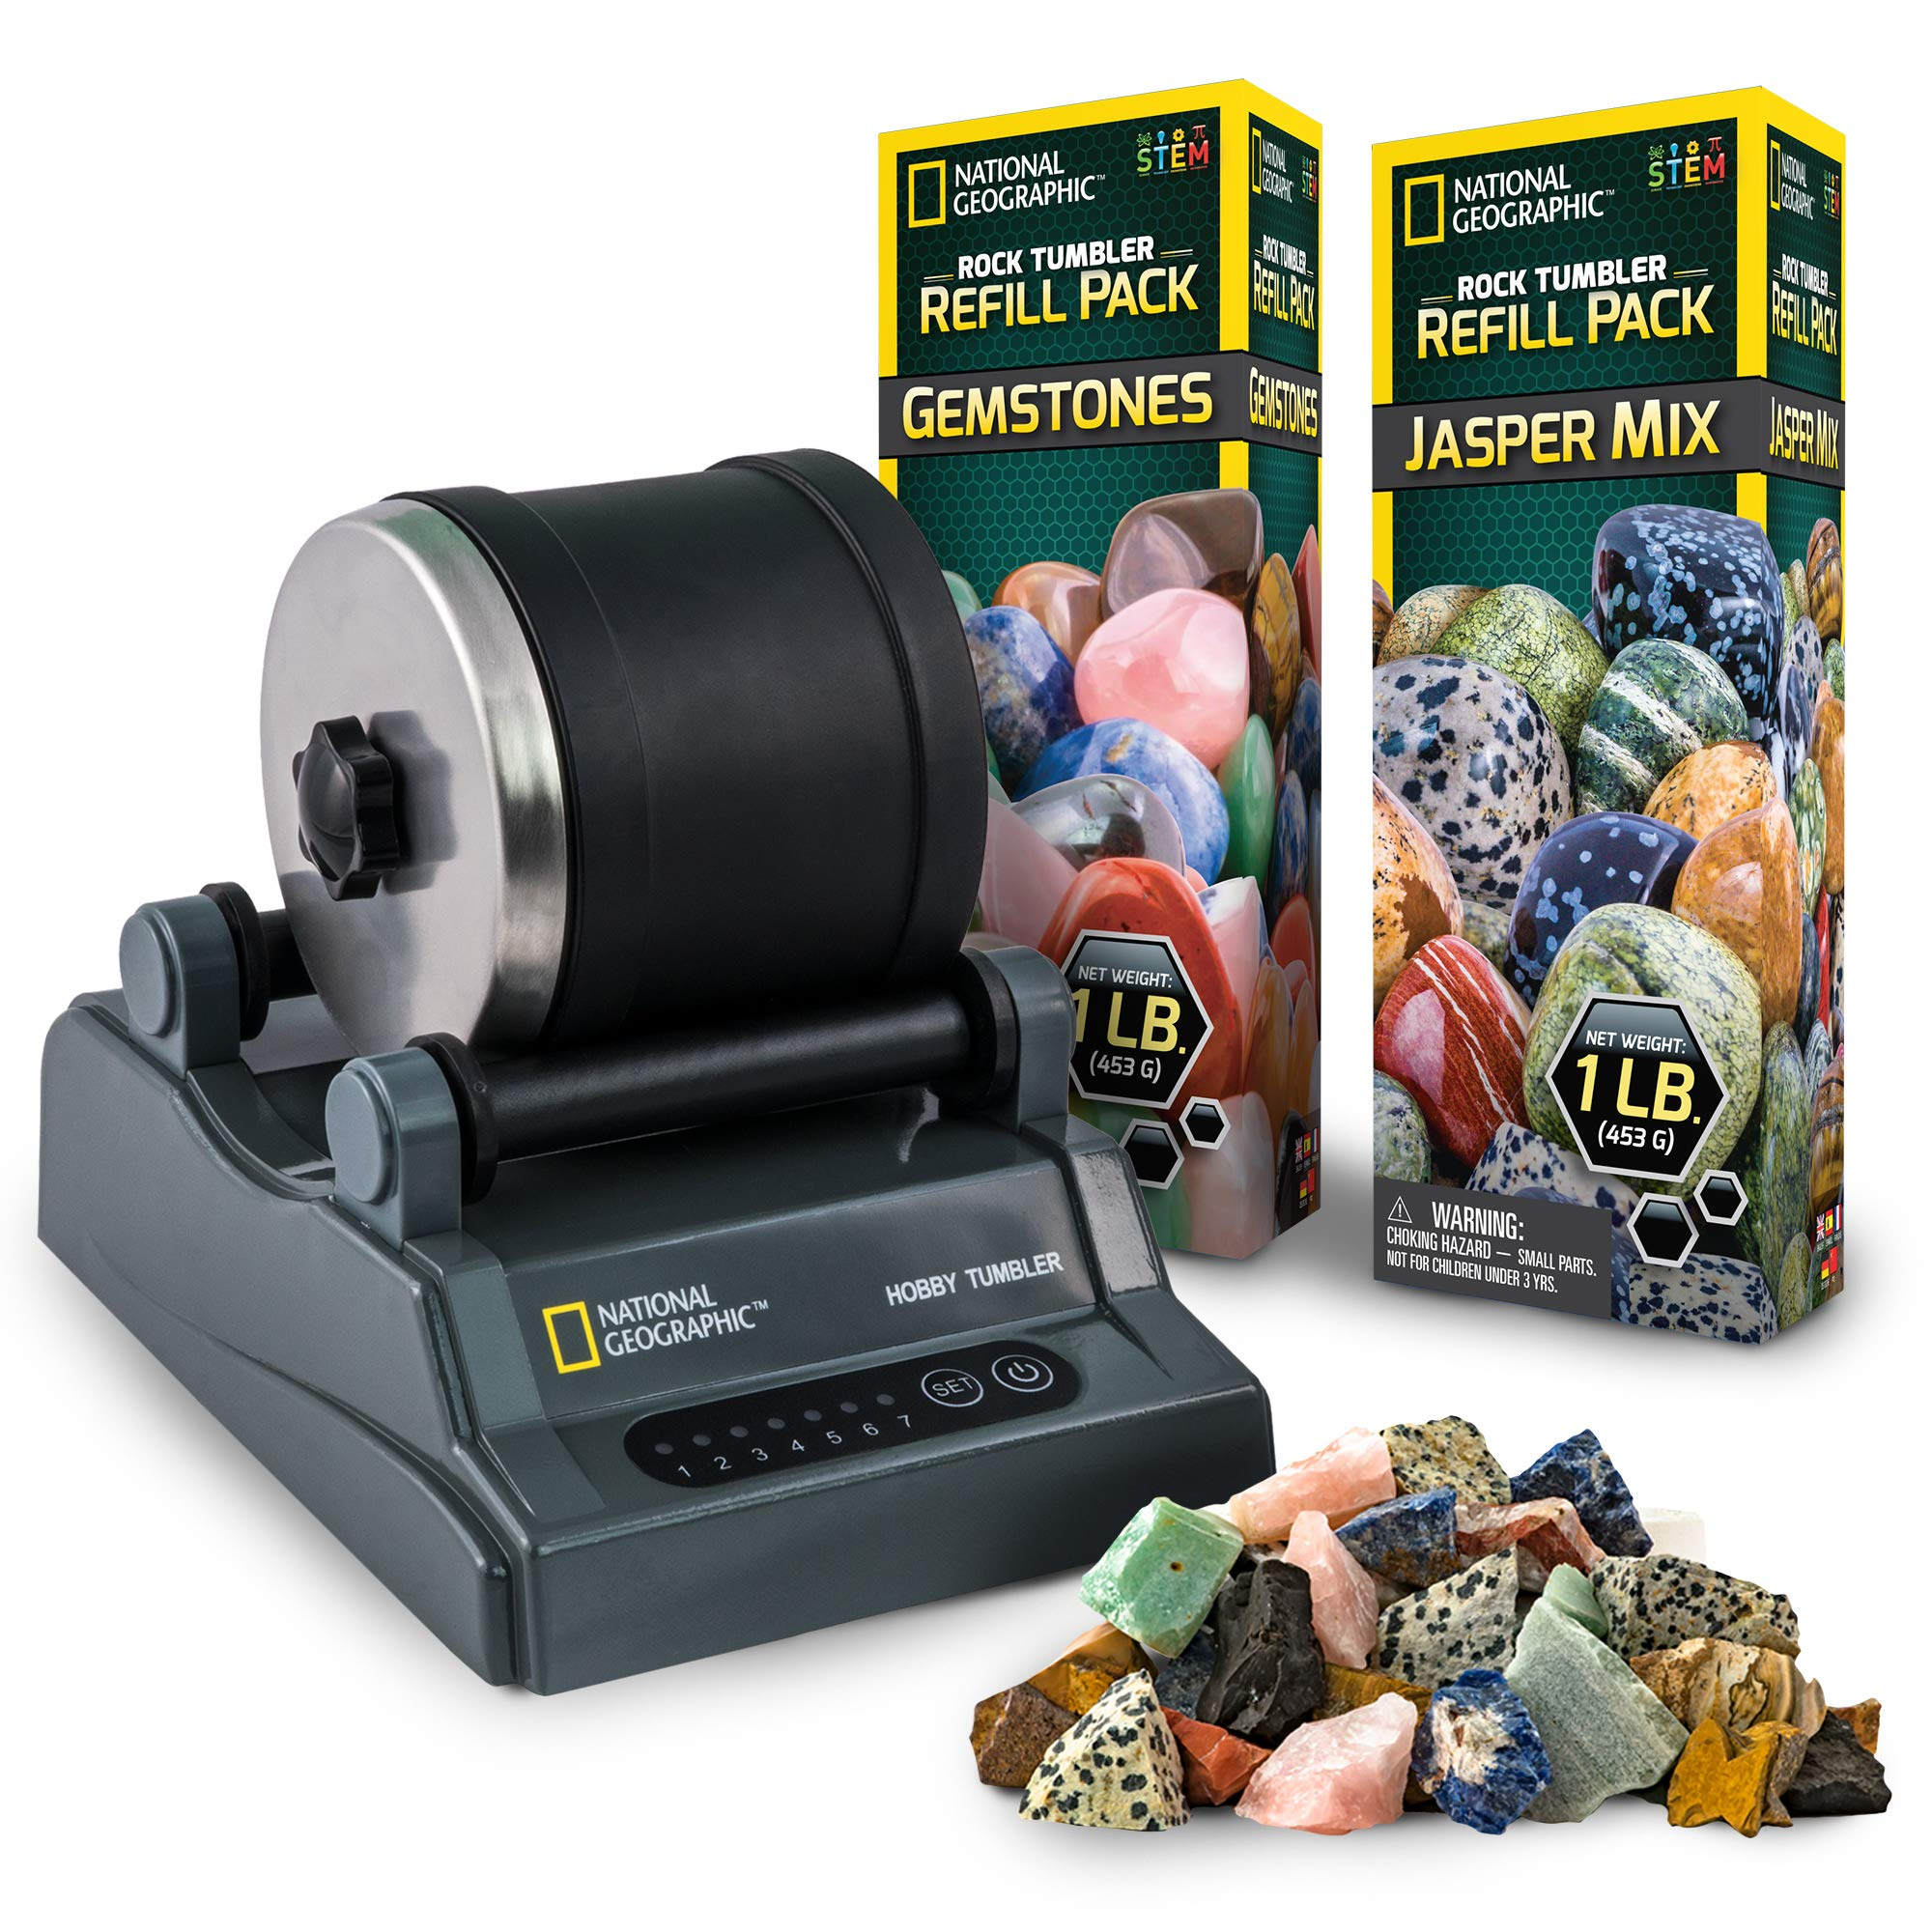 NATIONAL GEOGRAPHIC Hobby Rock Tumbler Kit with Two Bonus Rough Gemstone Refill Pack (Jasper Mix & Variety)